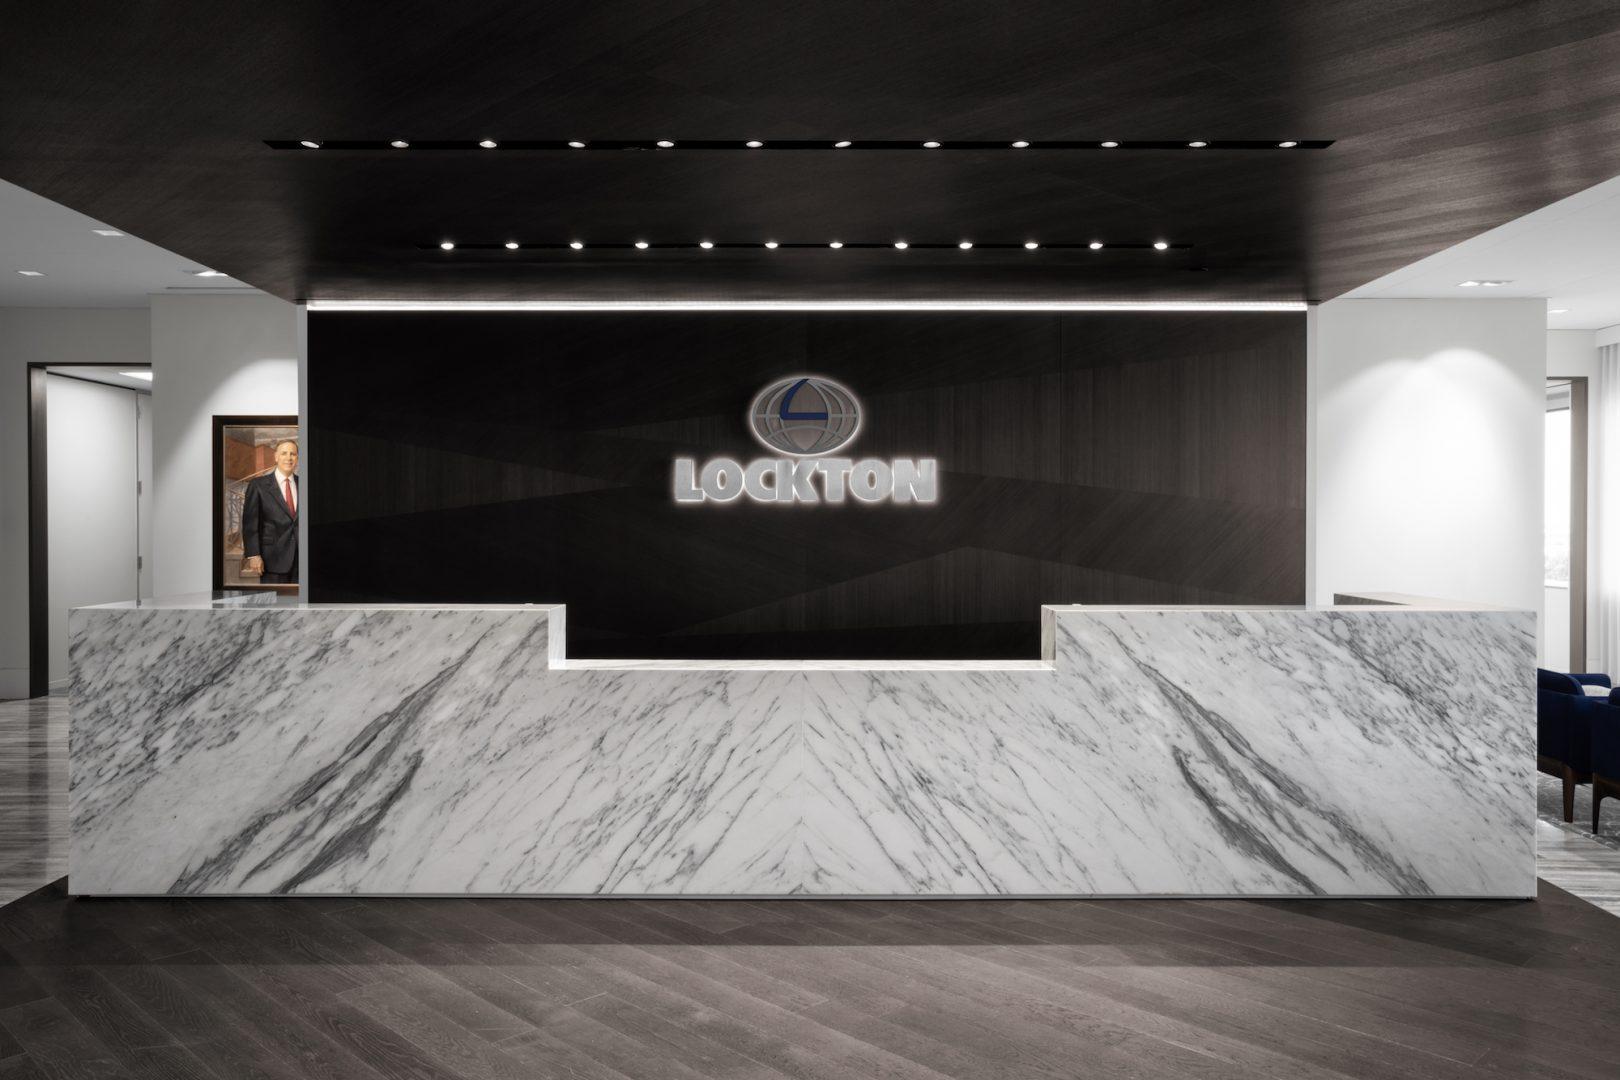 Corporate Interior Design Lockton Houston Reception Desk Bookmatch Quartzite Wood Panelling